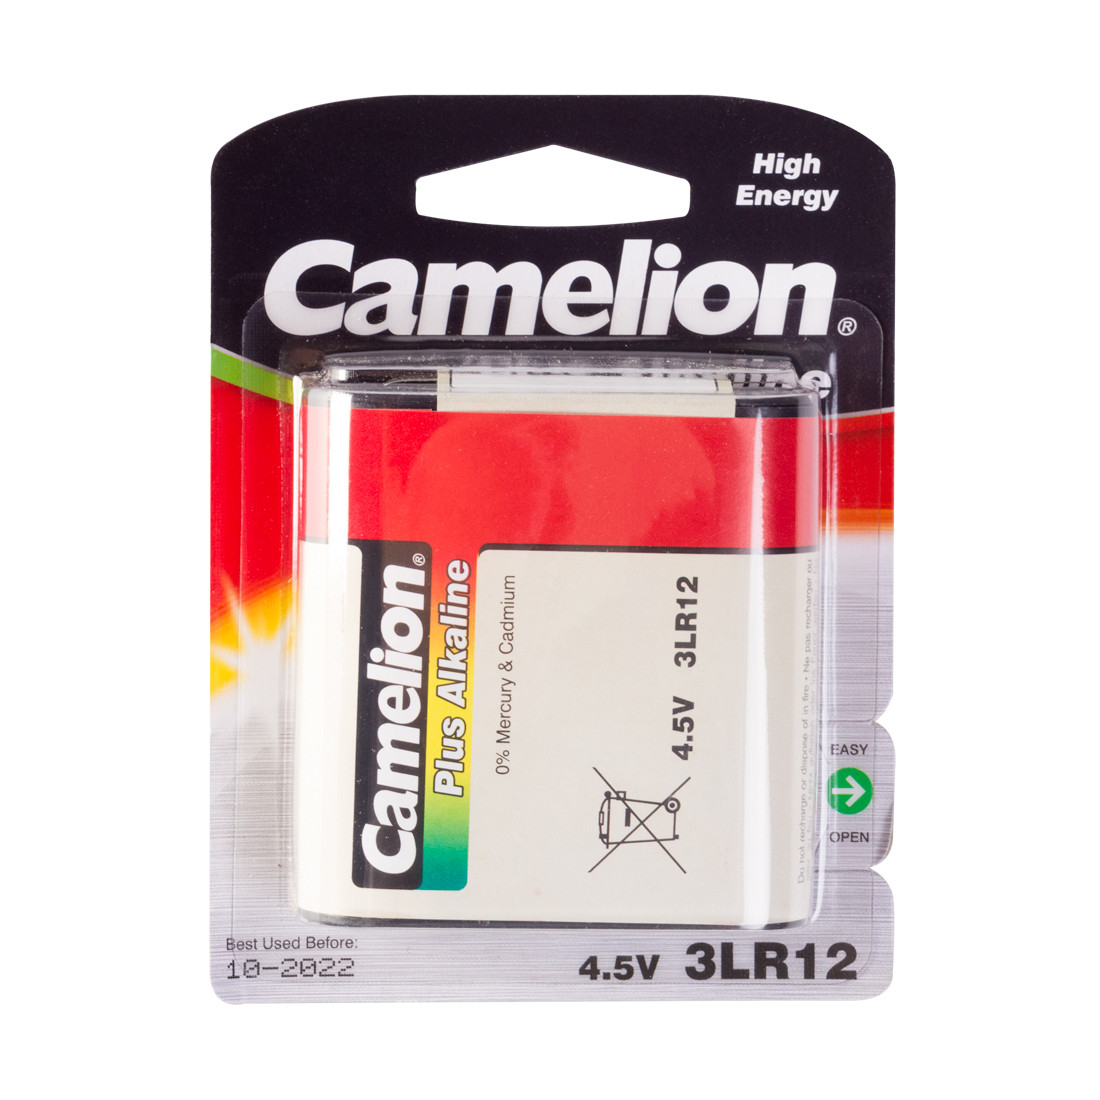 Батарейка, CAMELION, 3LR12-BP1, Plus Alkaline, 3LR12, 4.5V, 1 шт., Блистер